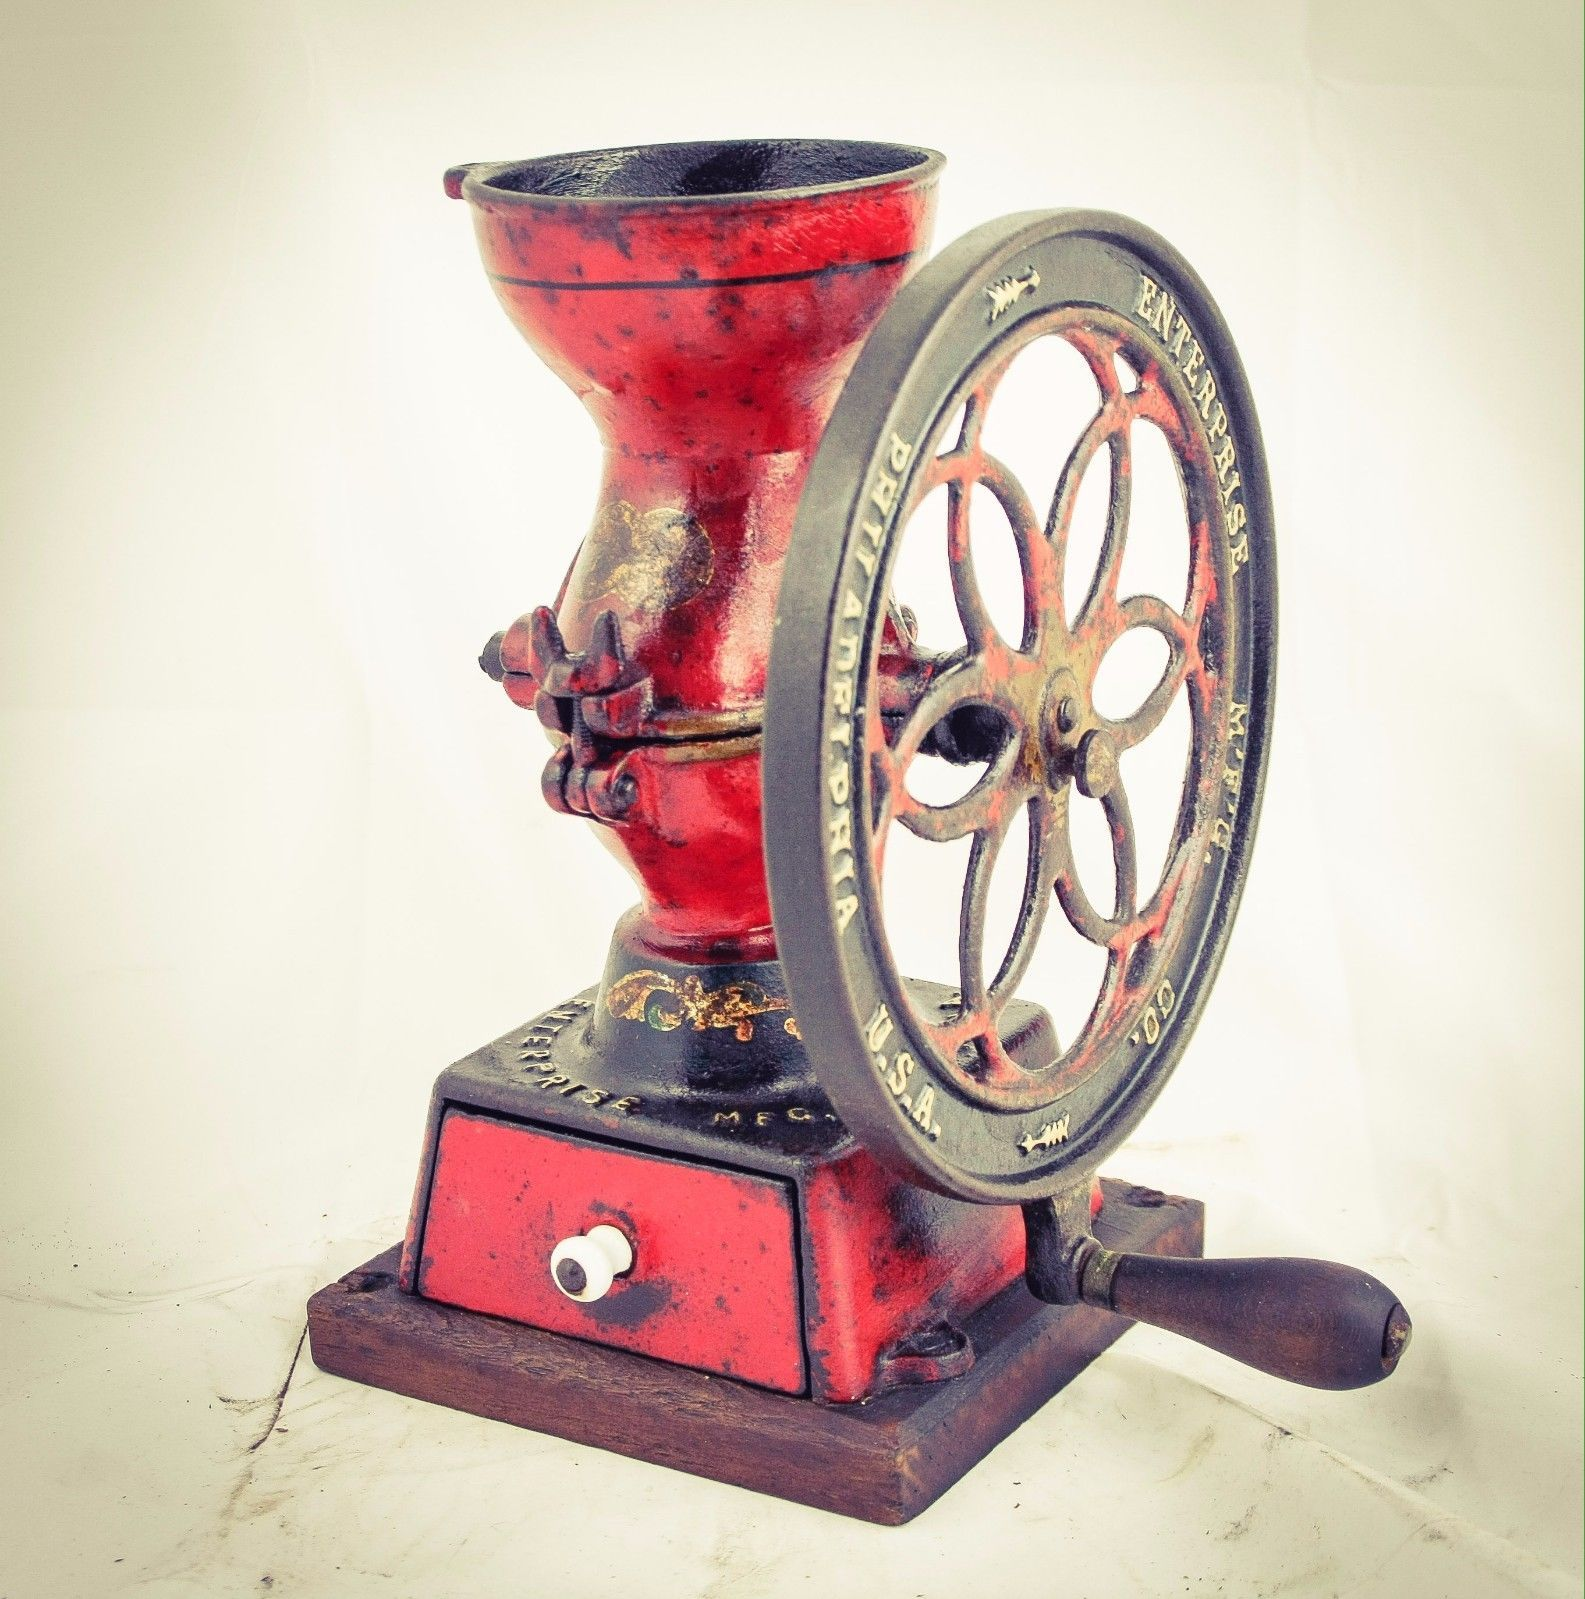 Antique philadelphia enterprise coffee grinder no2 cast